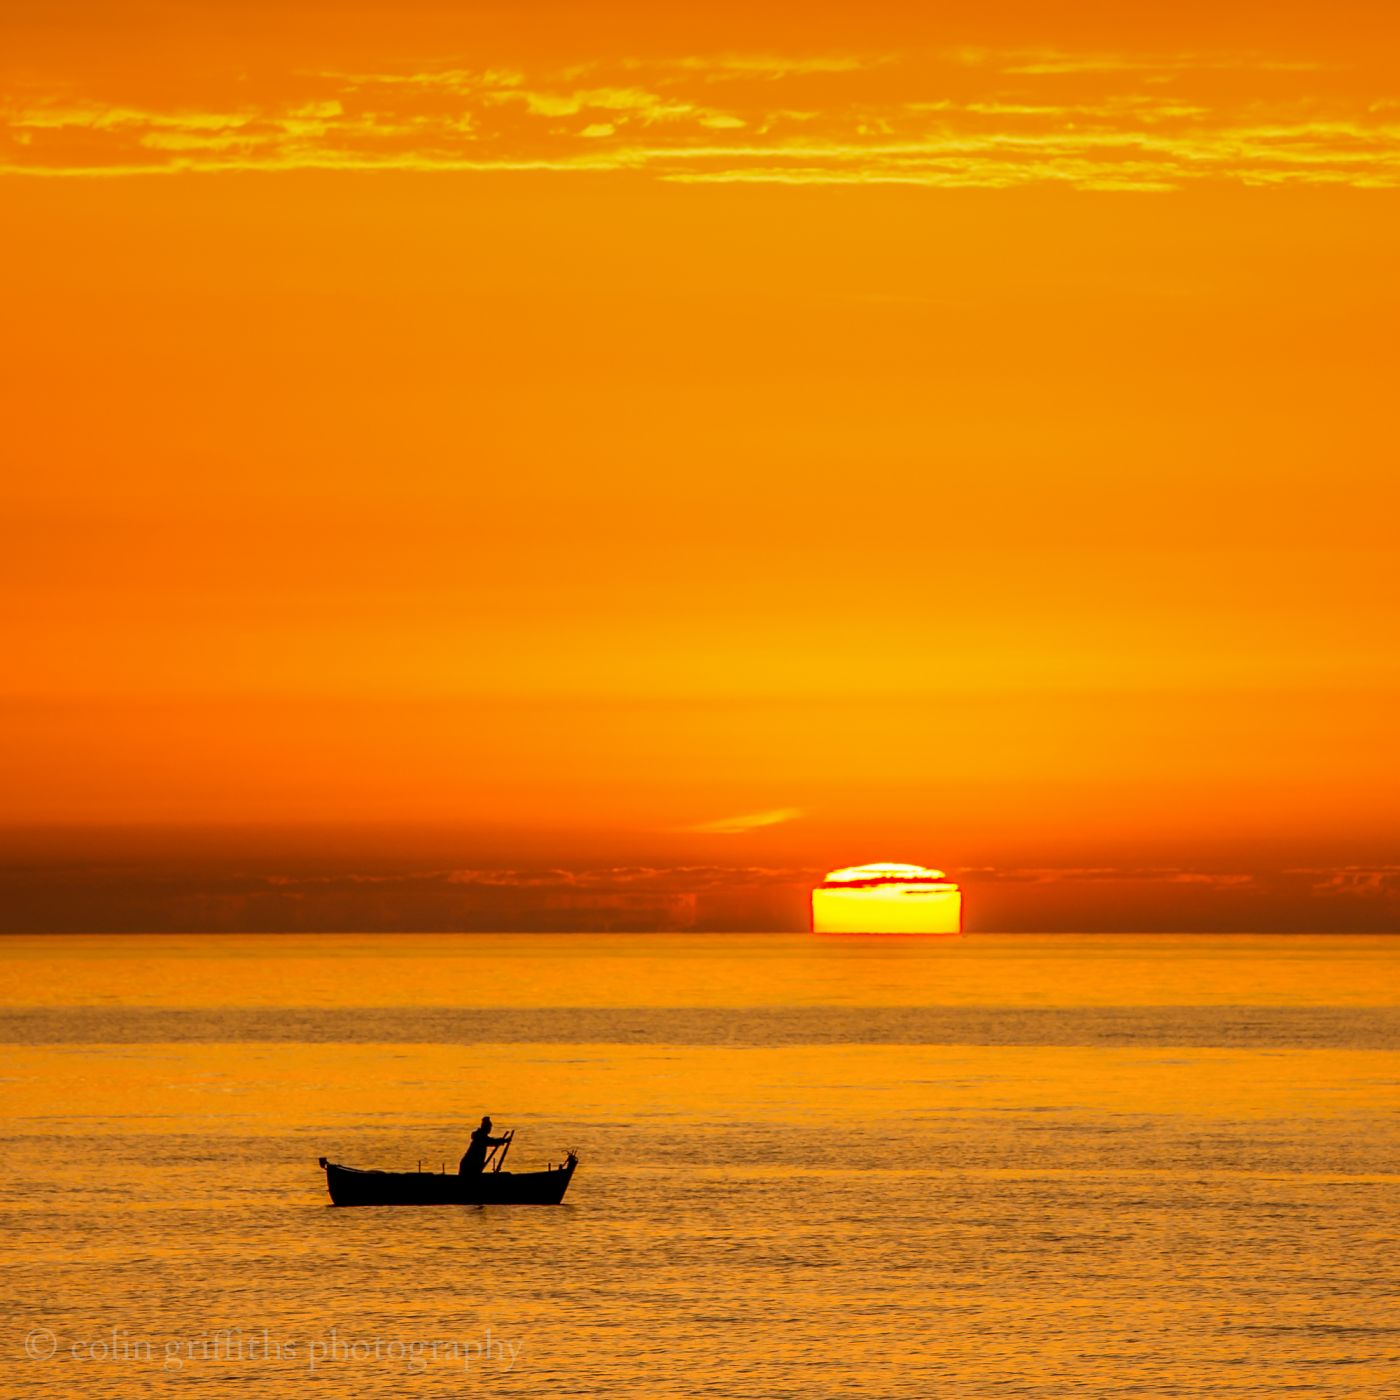 Bari sunrise, Italy